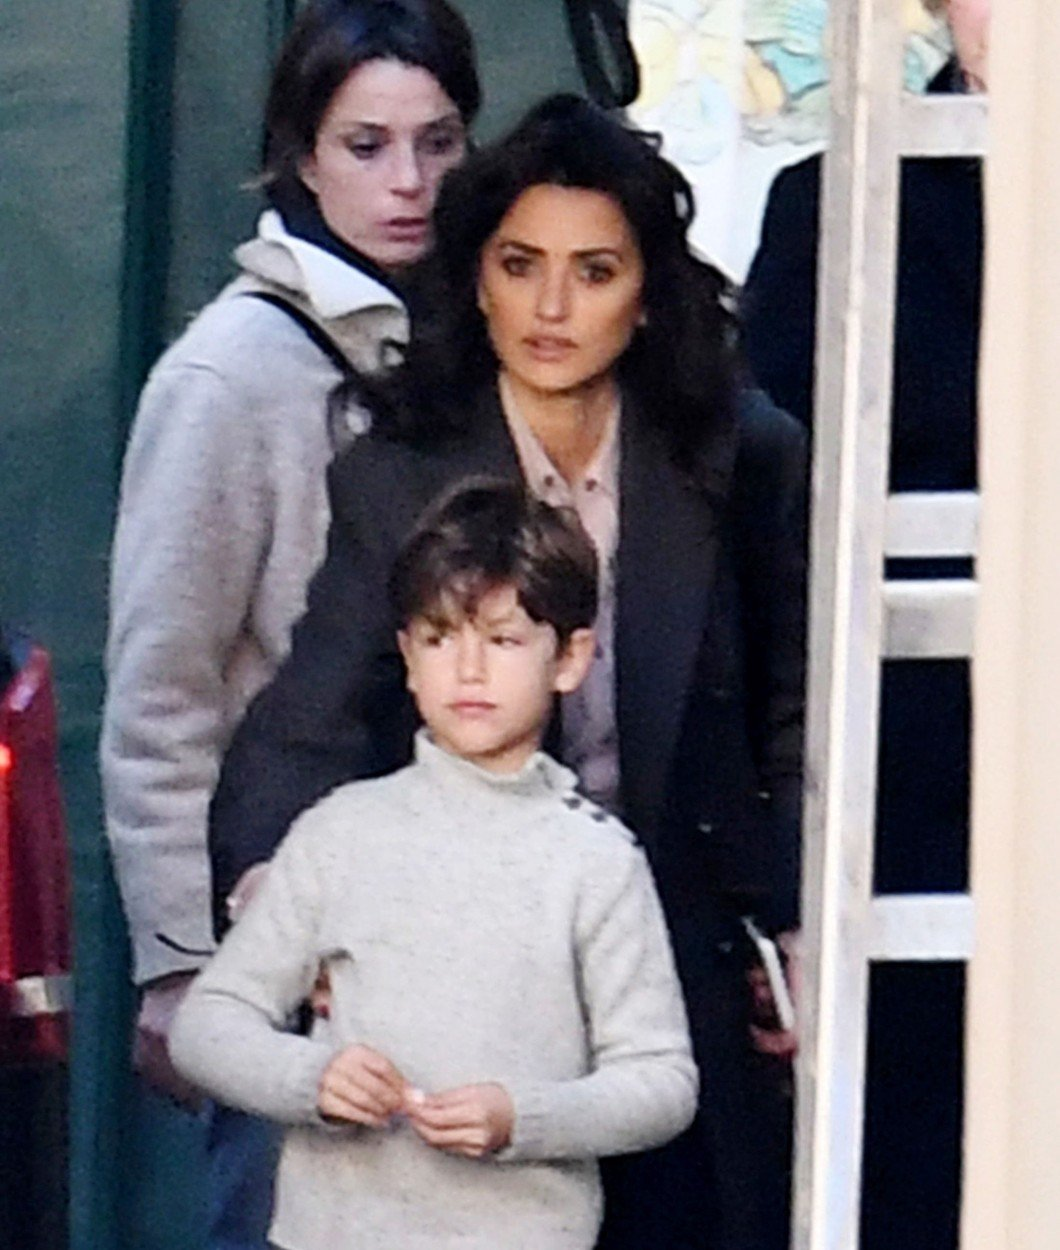 Penelope Cruz finally showed her 7 year old son Leo in Public